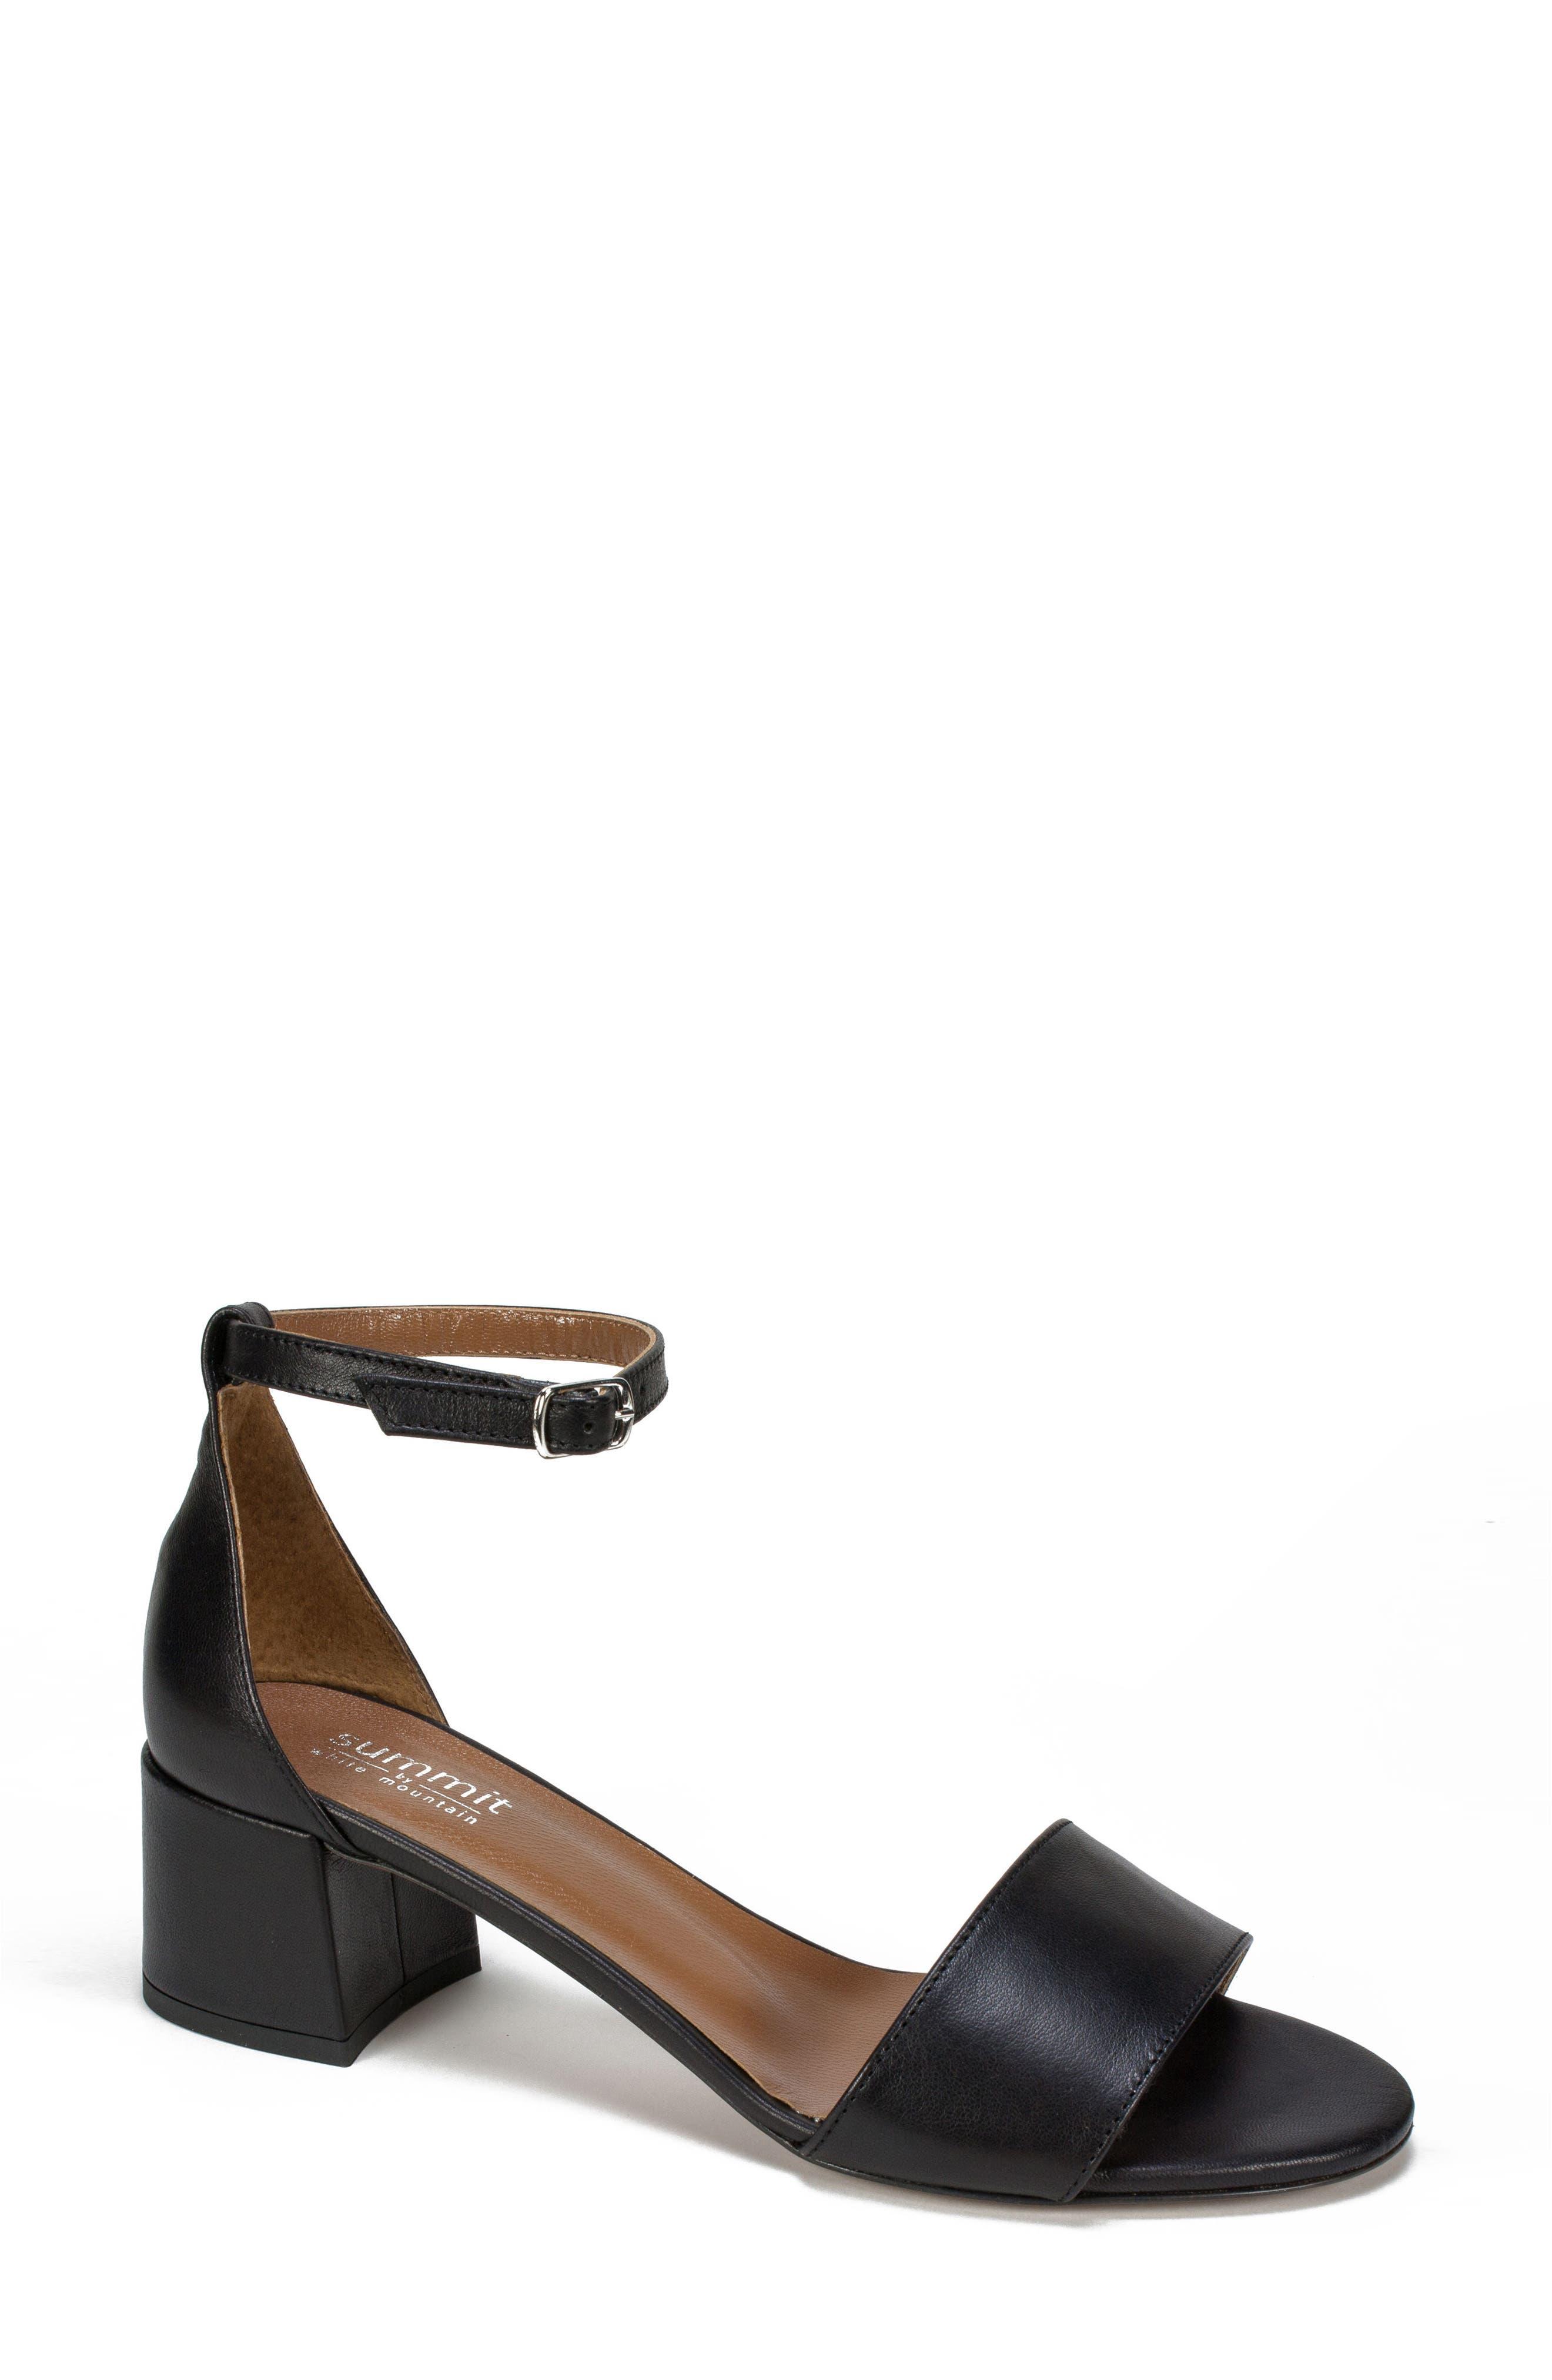 Ameila Block Heel Sandal,                         Main,                         color, Black Leather